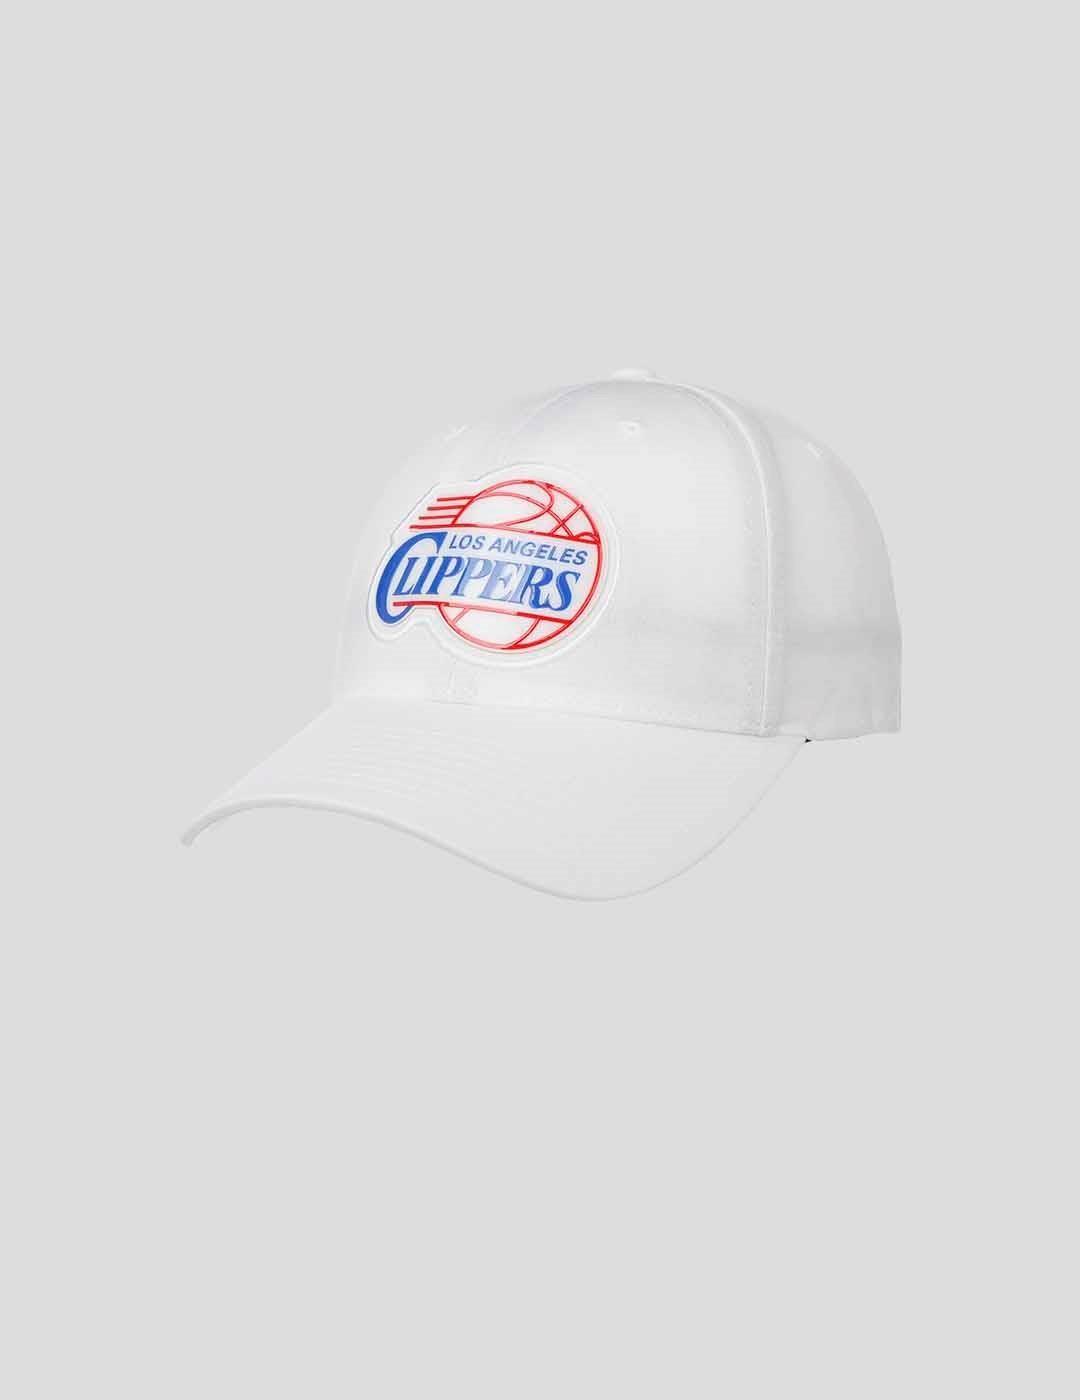 GORRA MITCHELL & NESS NBA PRIME LOW PRO LA CLIPPERS WHITE